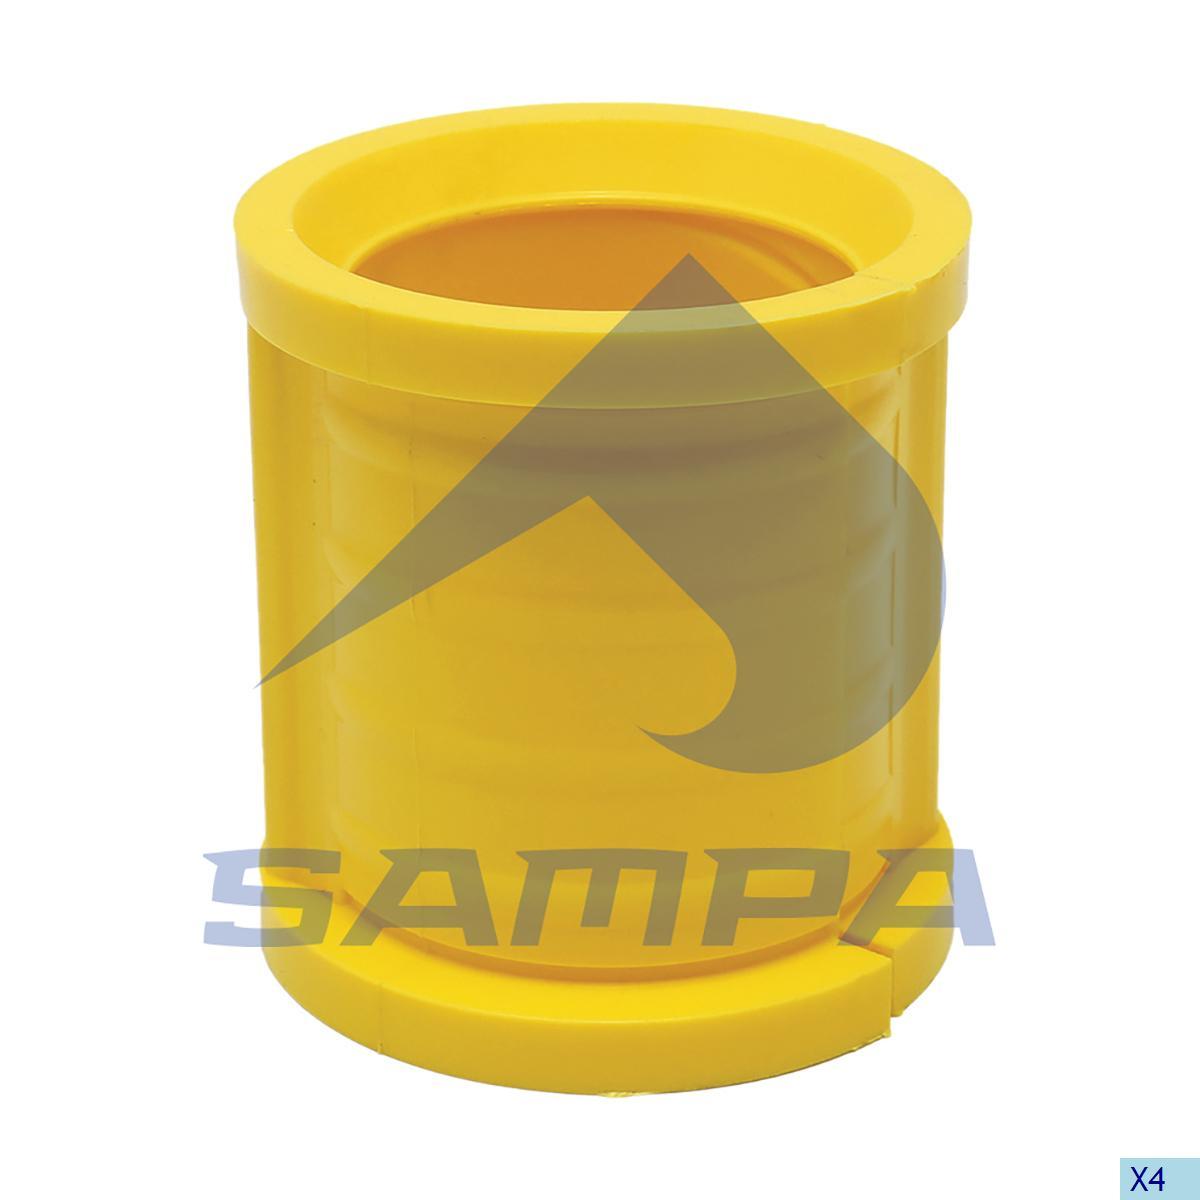 Bearing, Stabilizer Bar, Volvo, Suspension